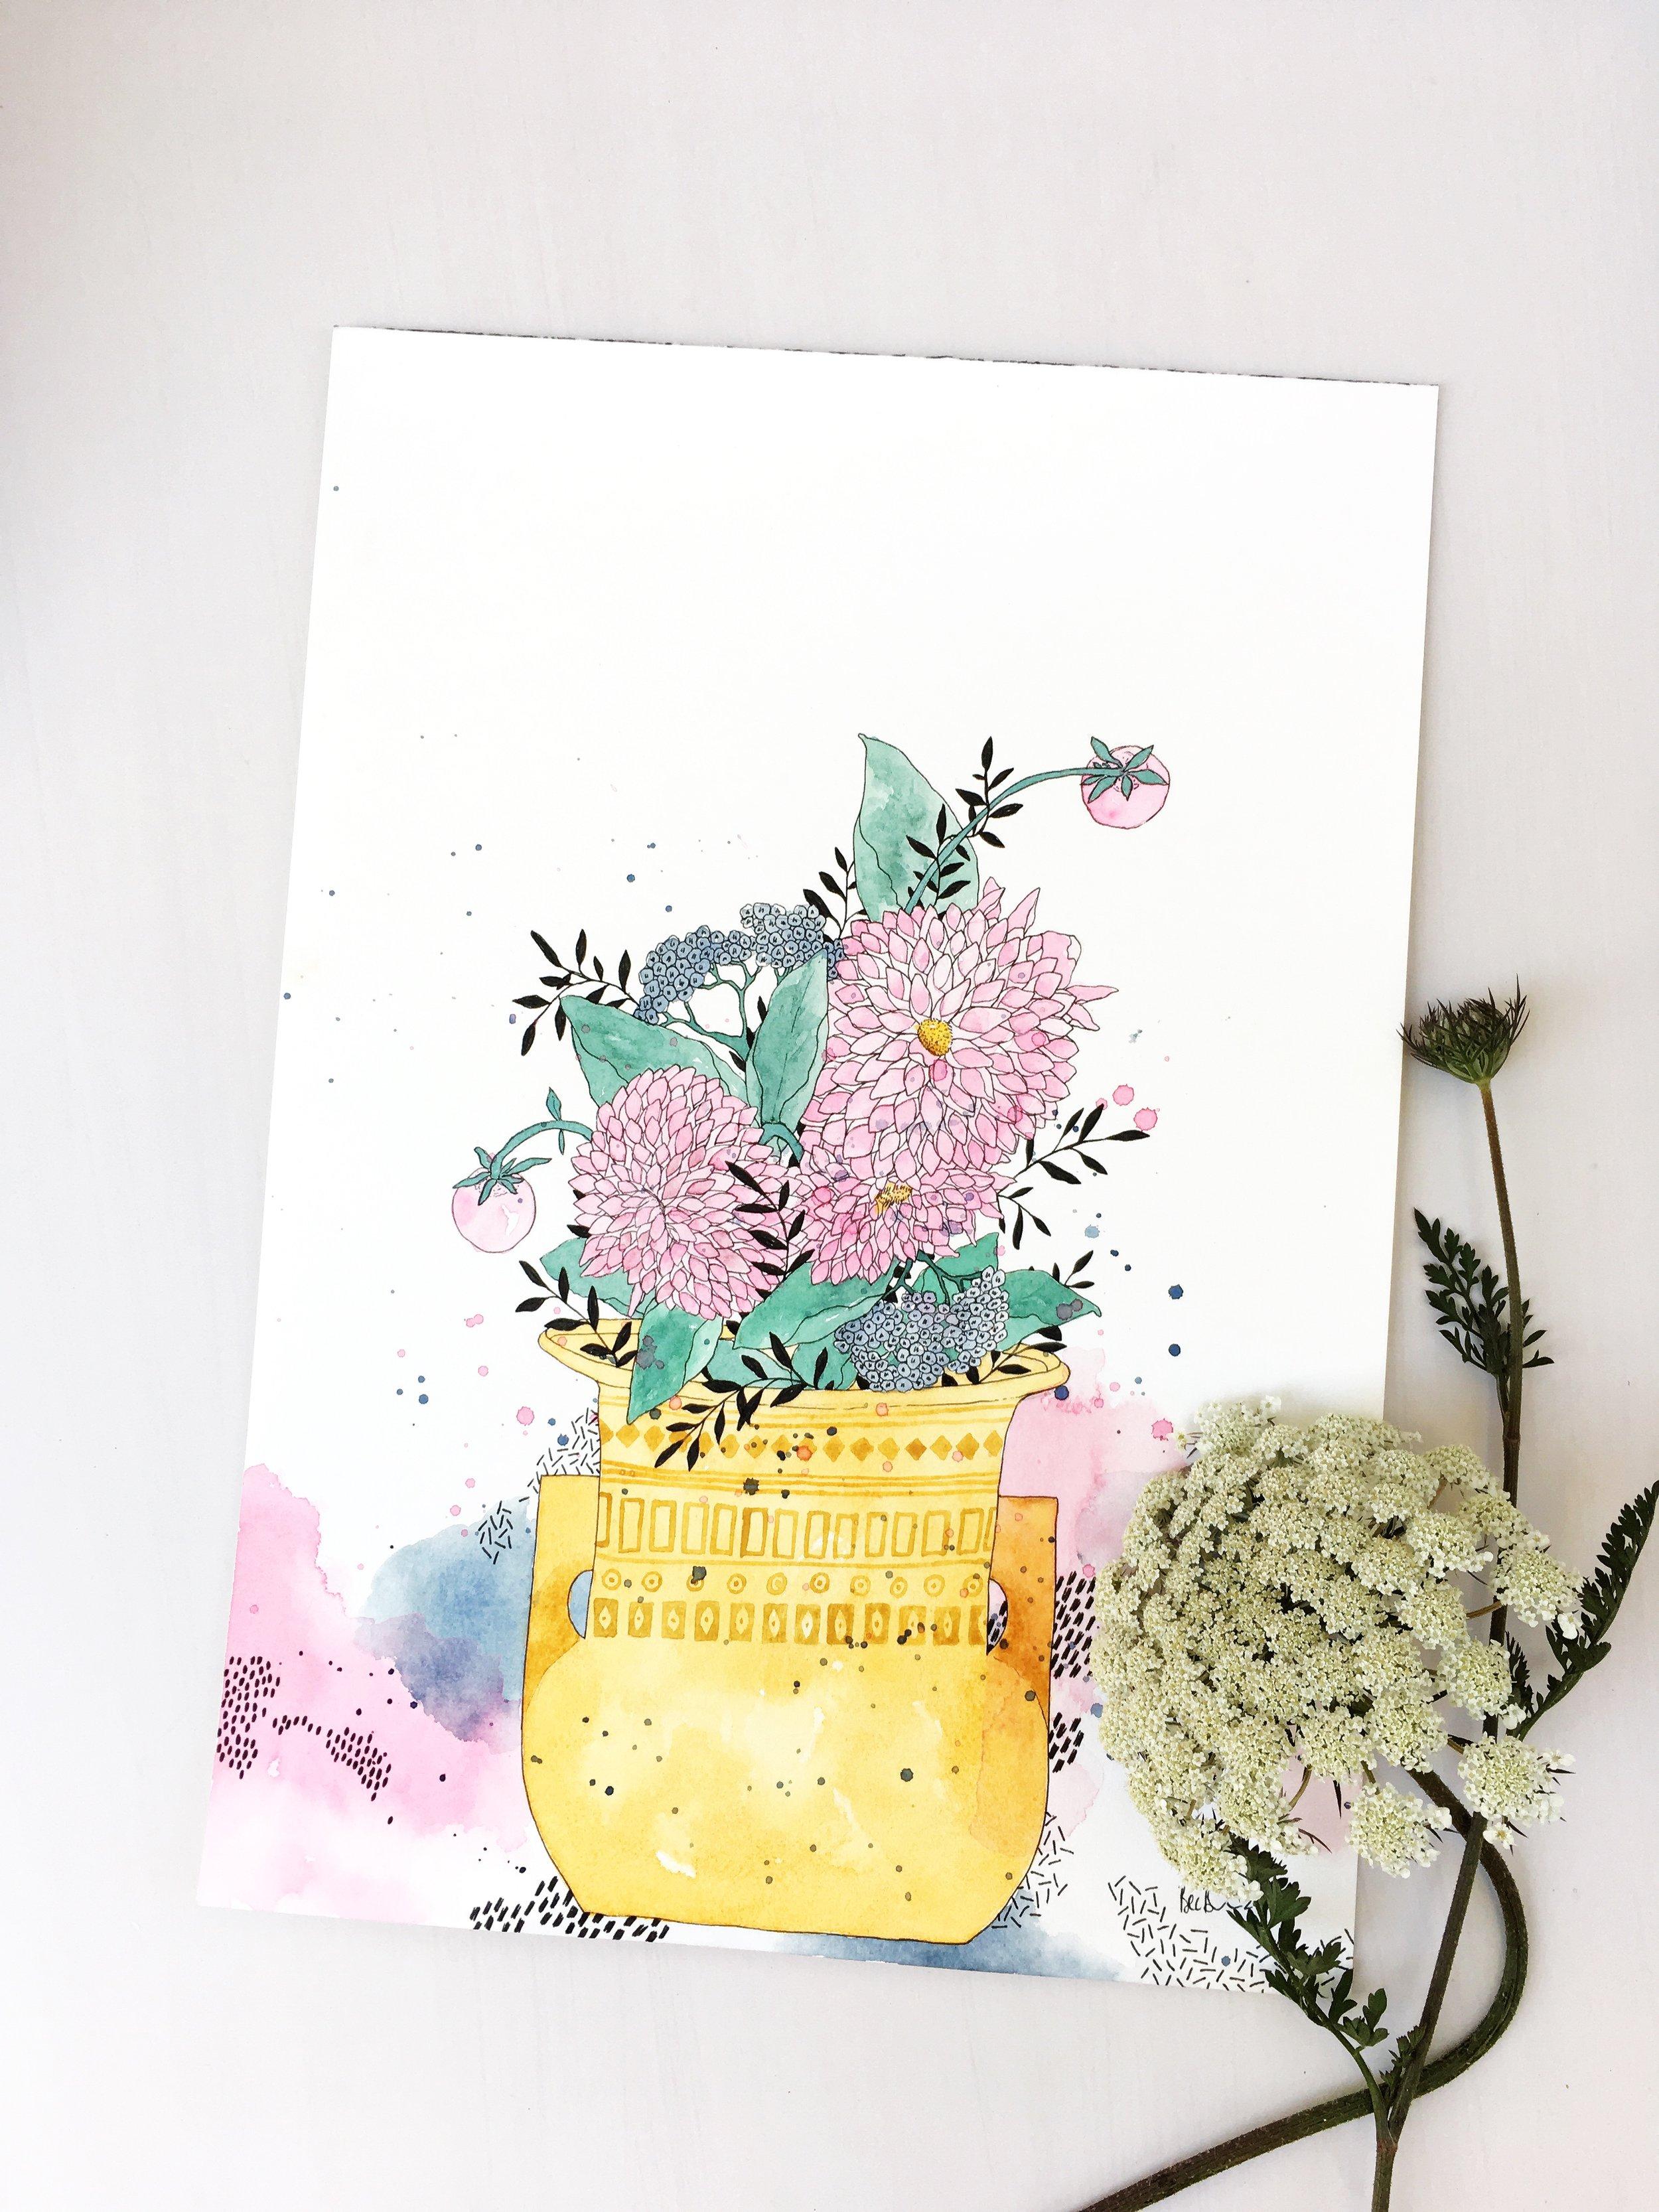 Spring Blooms - A3 Original